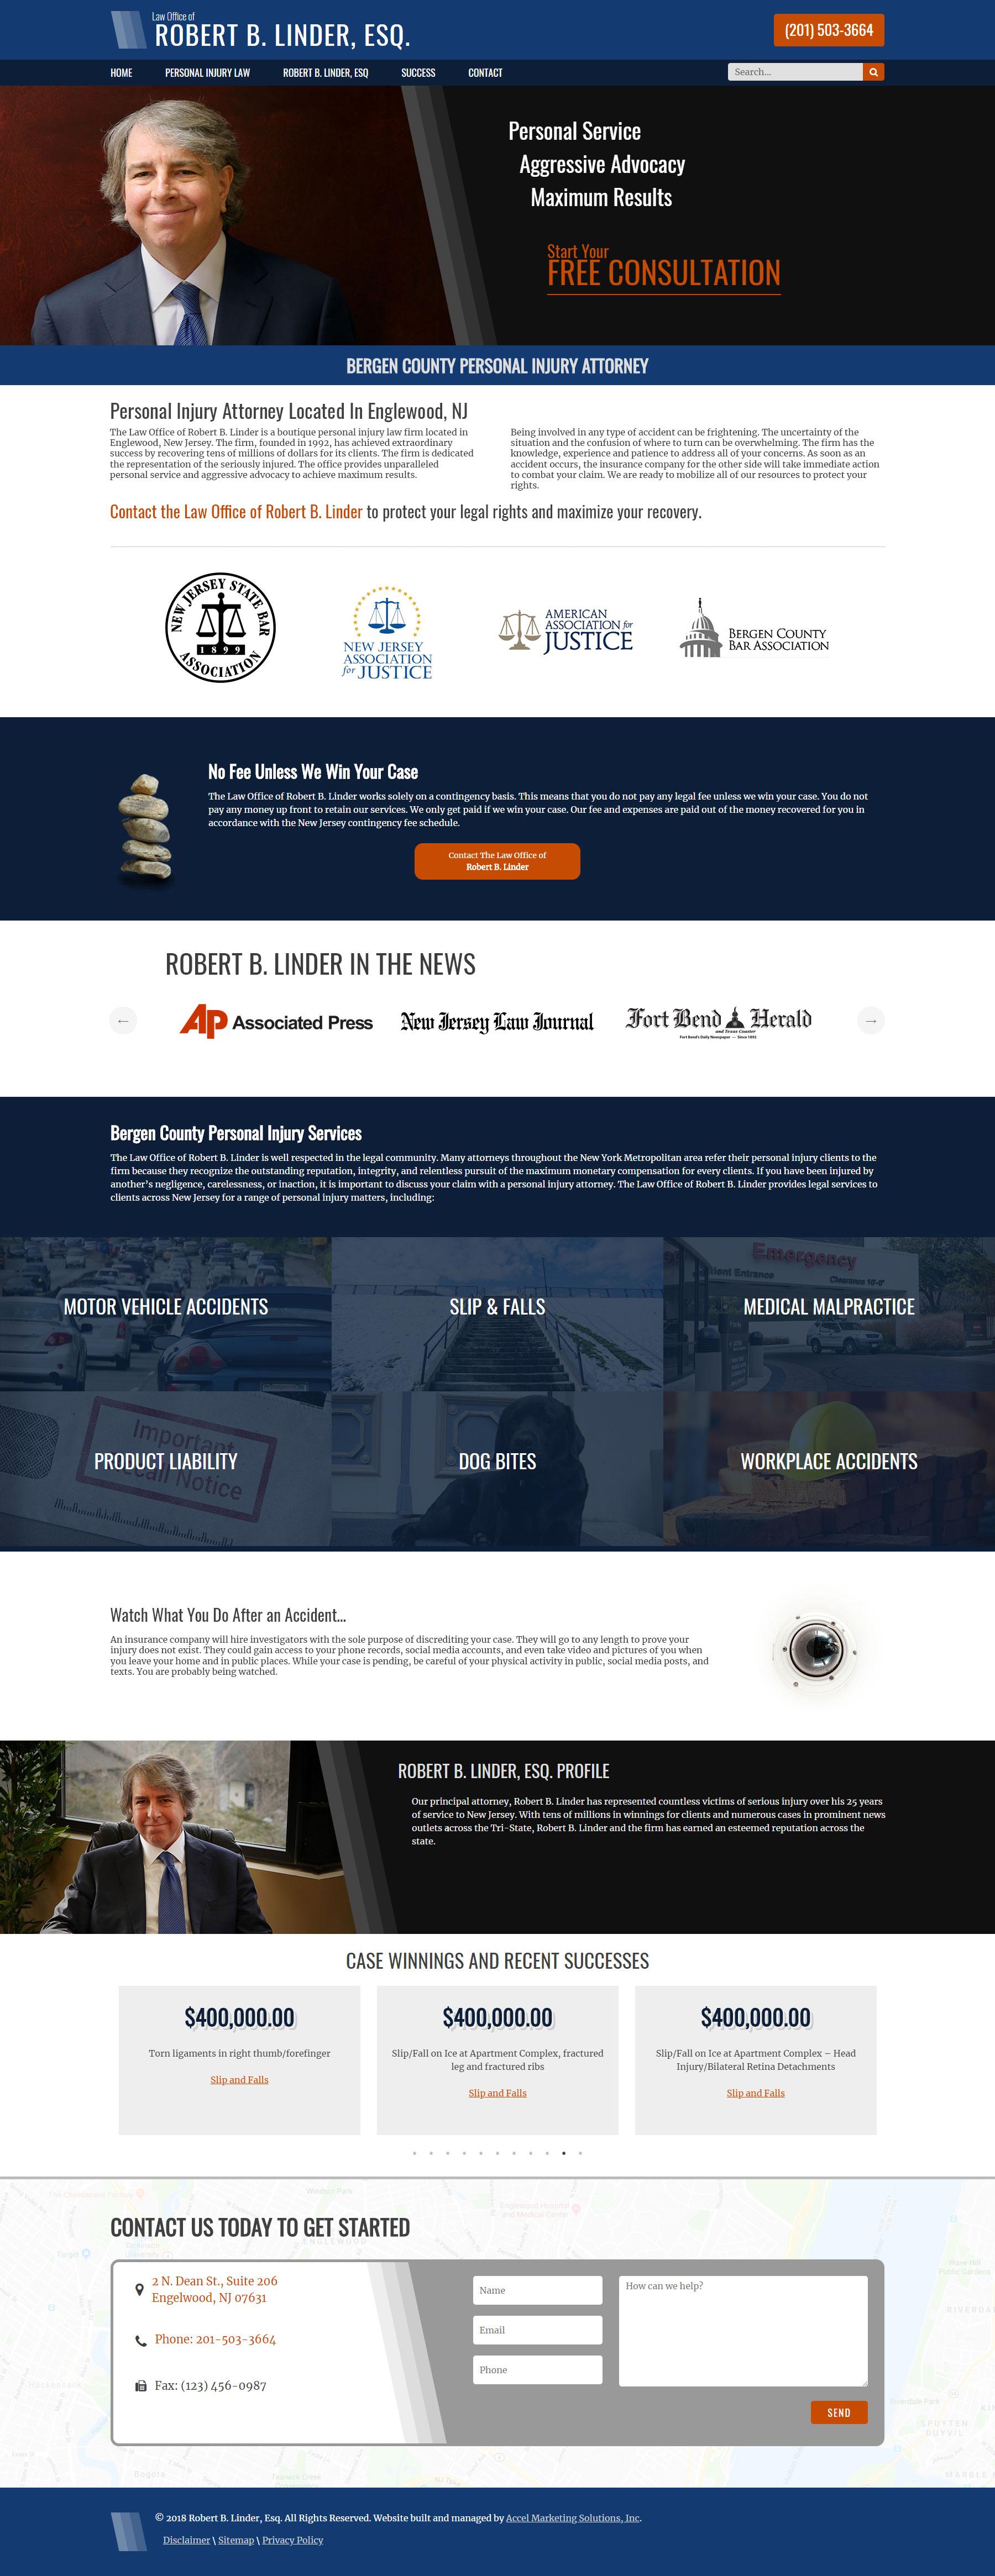 Robert B. Linder Website Design